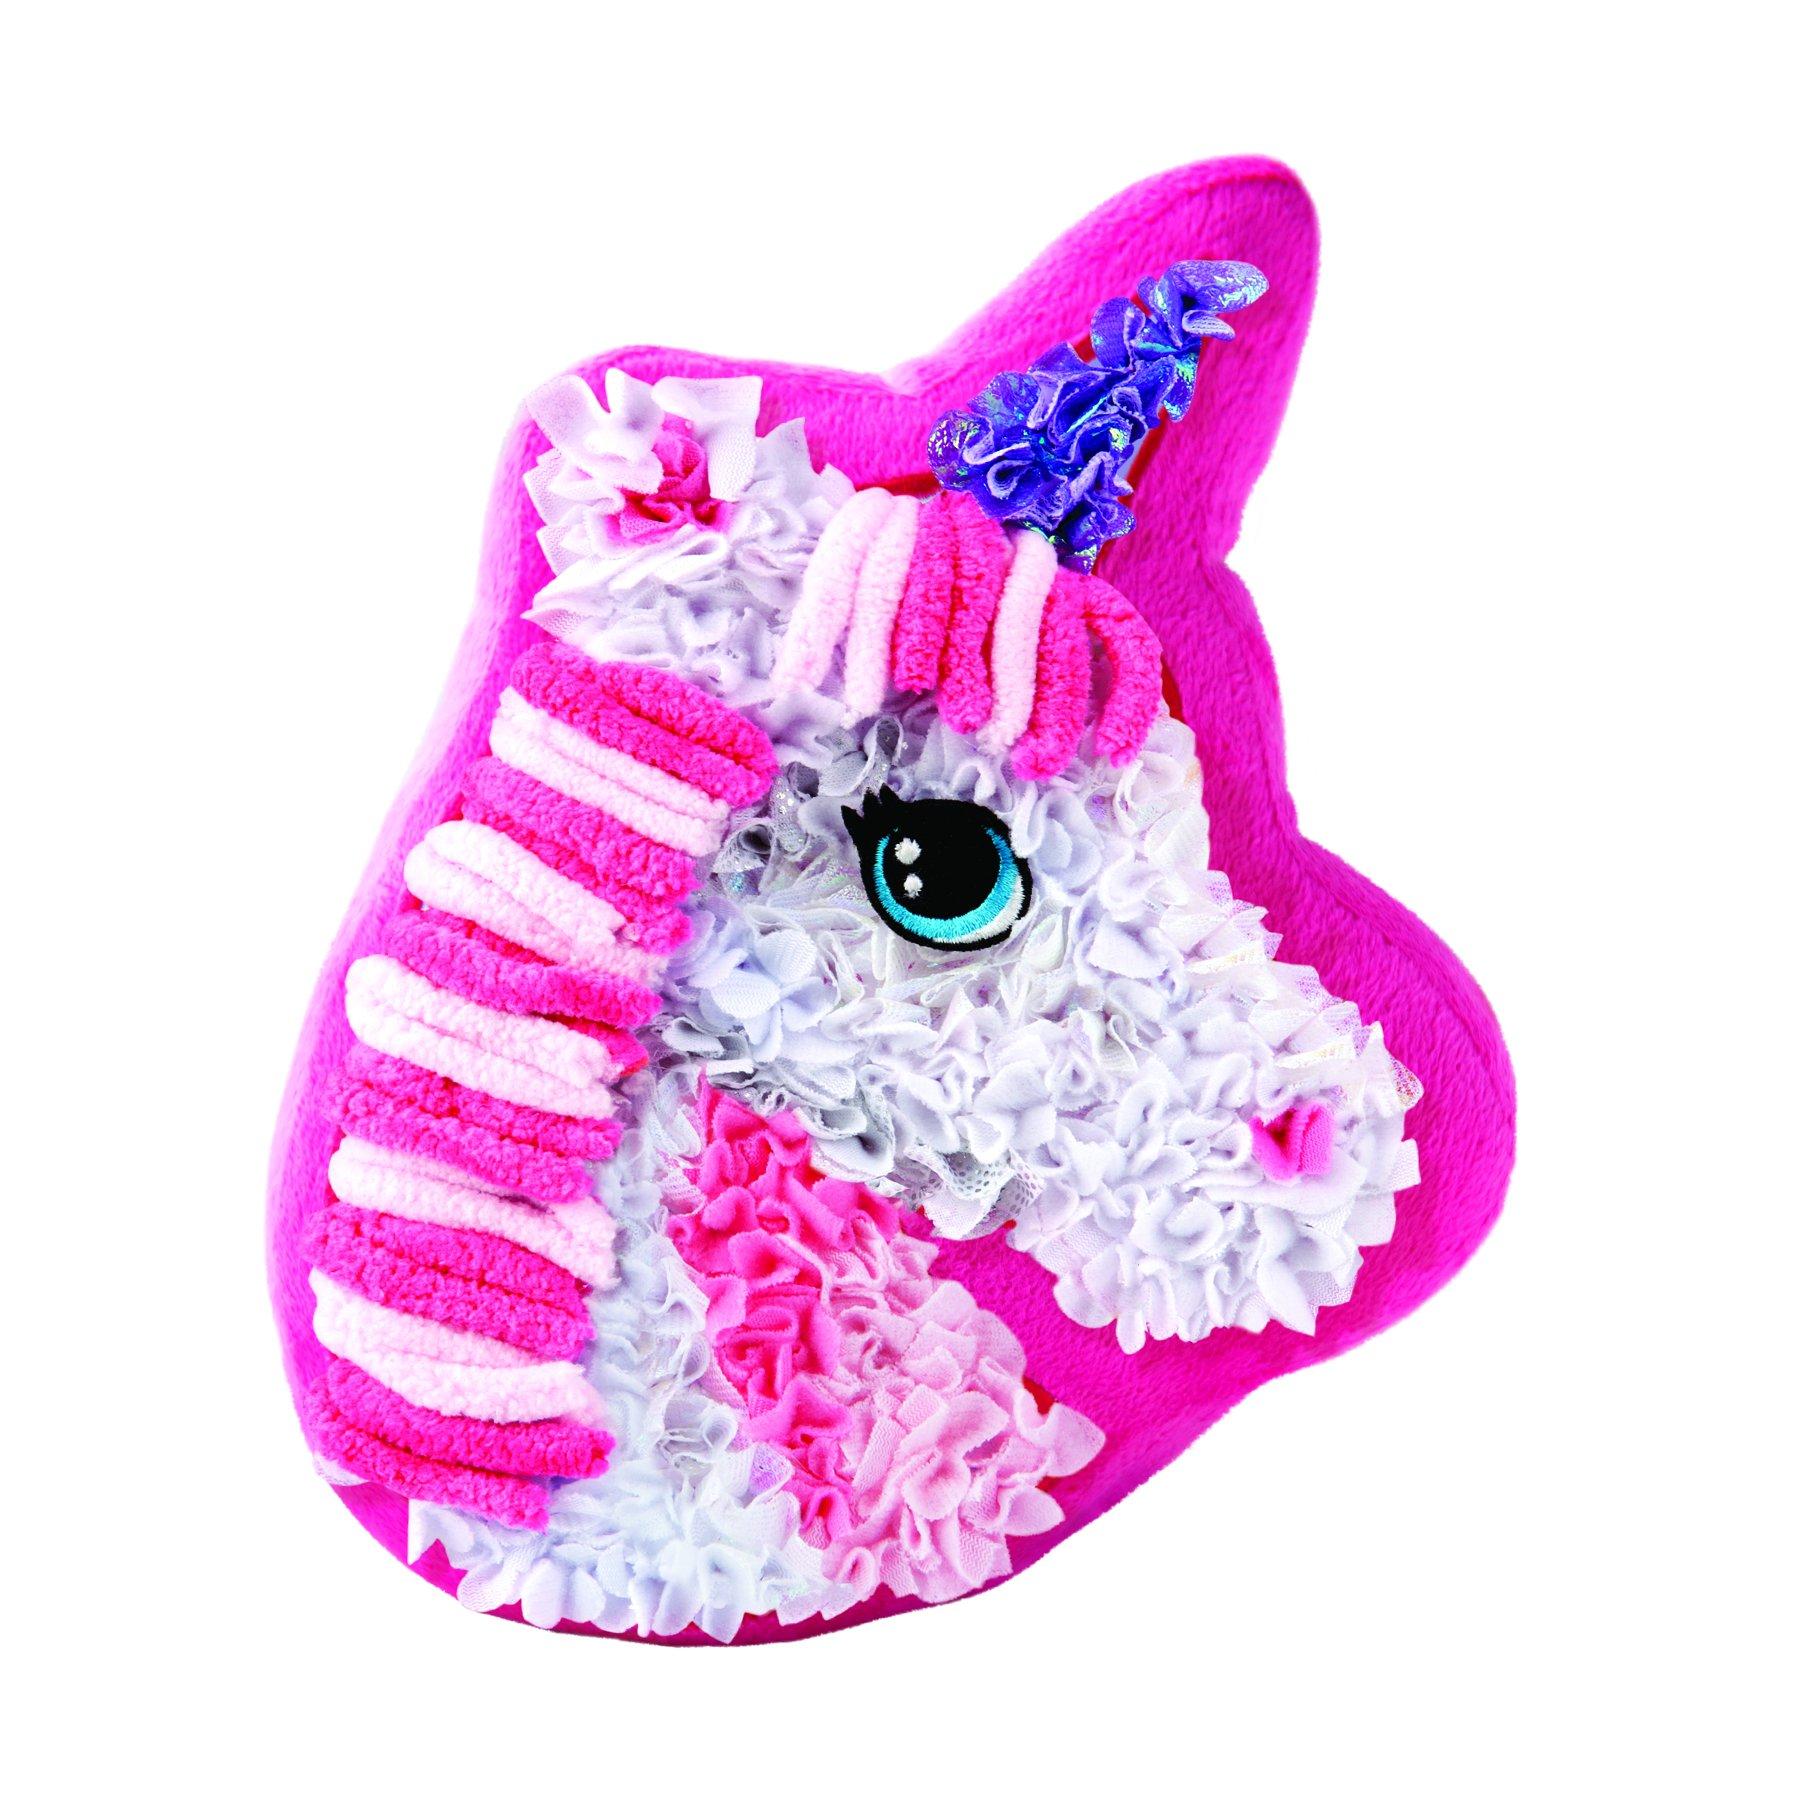 The Orb Factory PlushCraft Unicorn Pillow